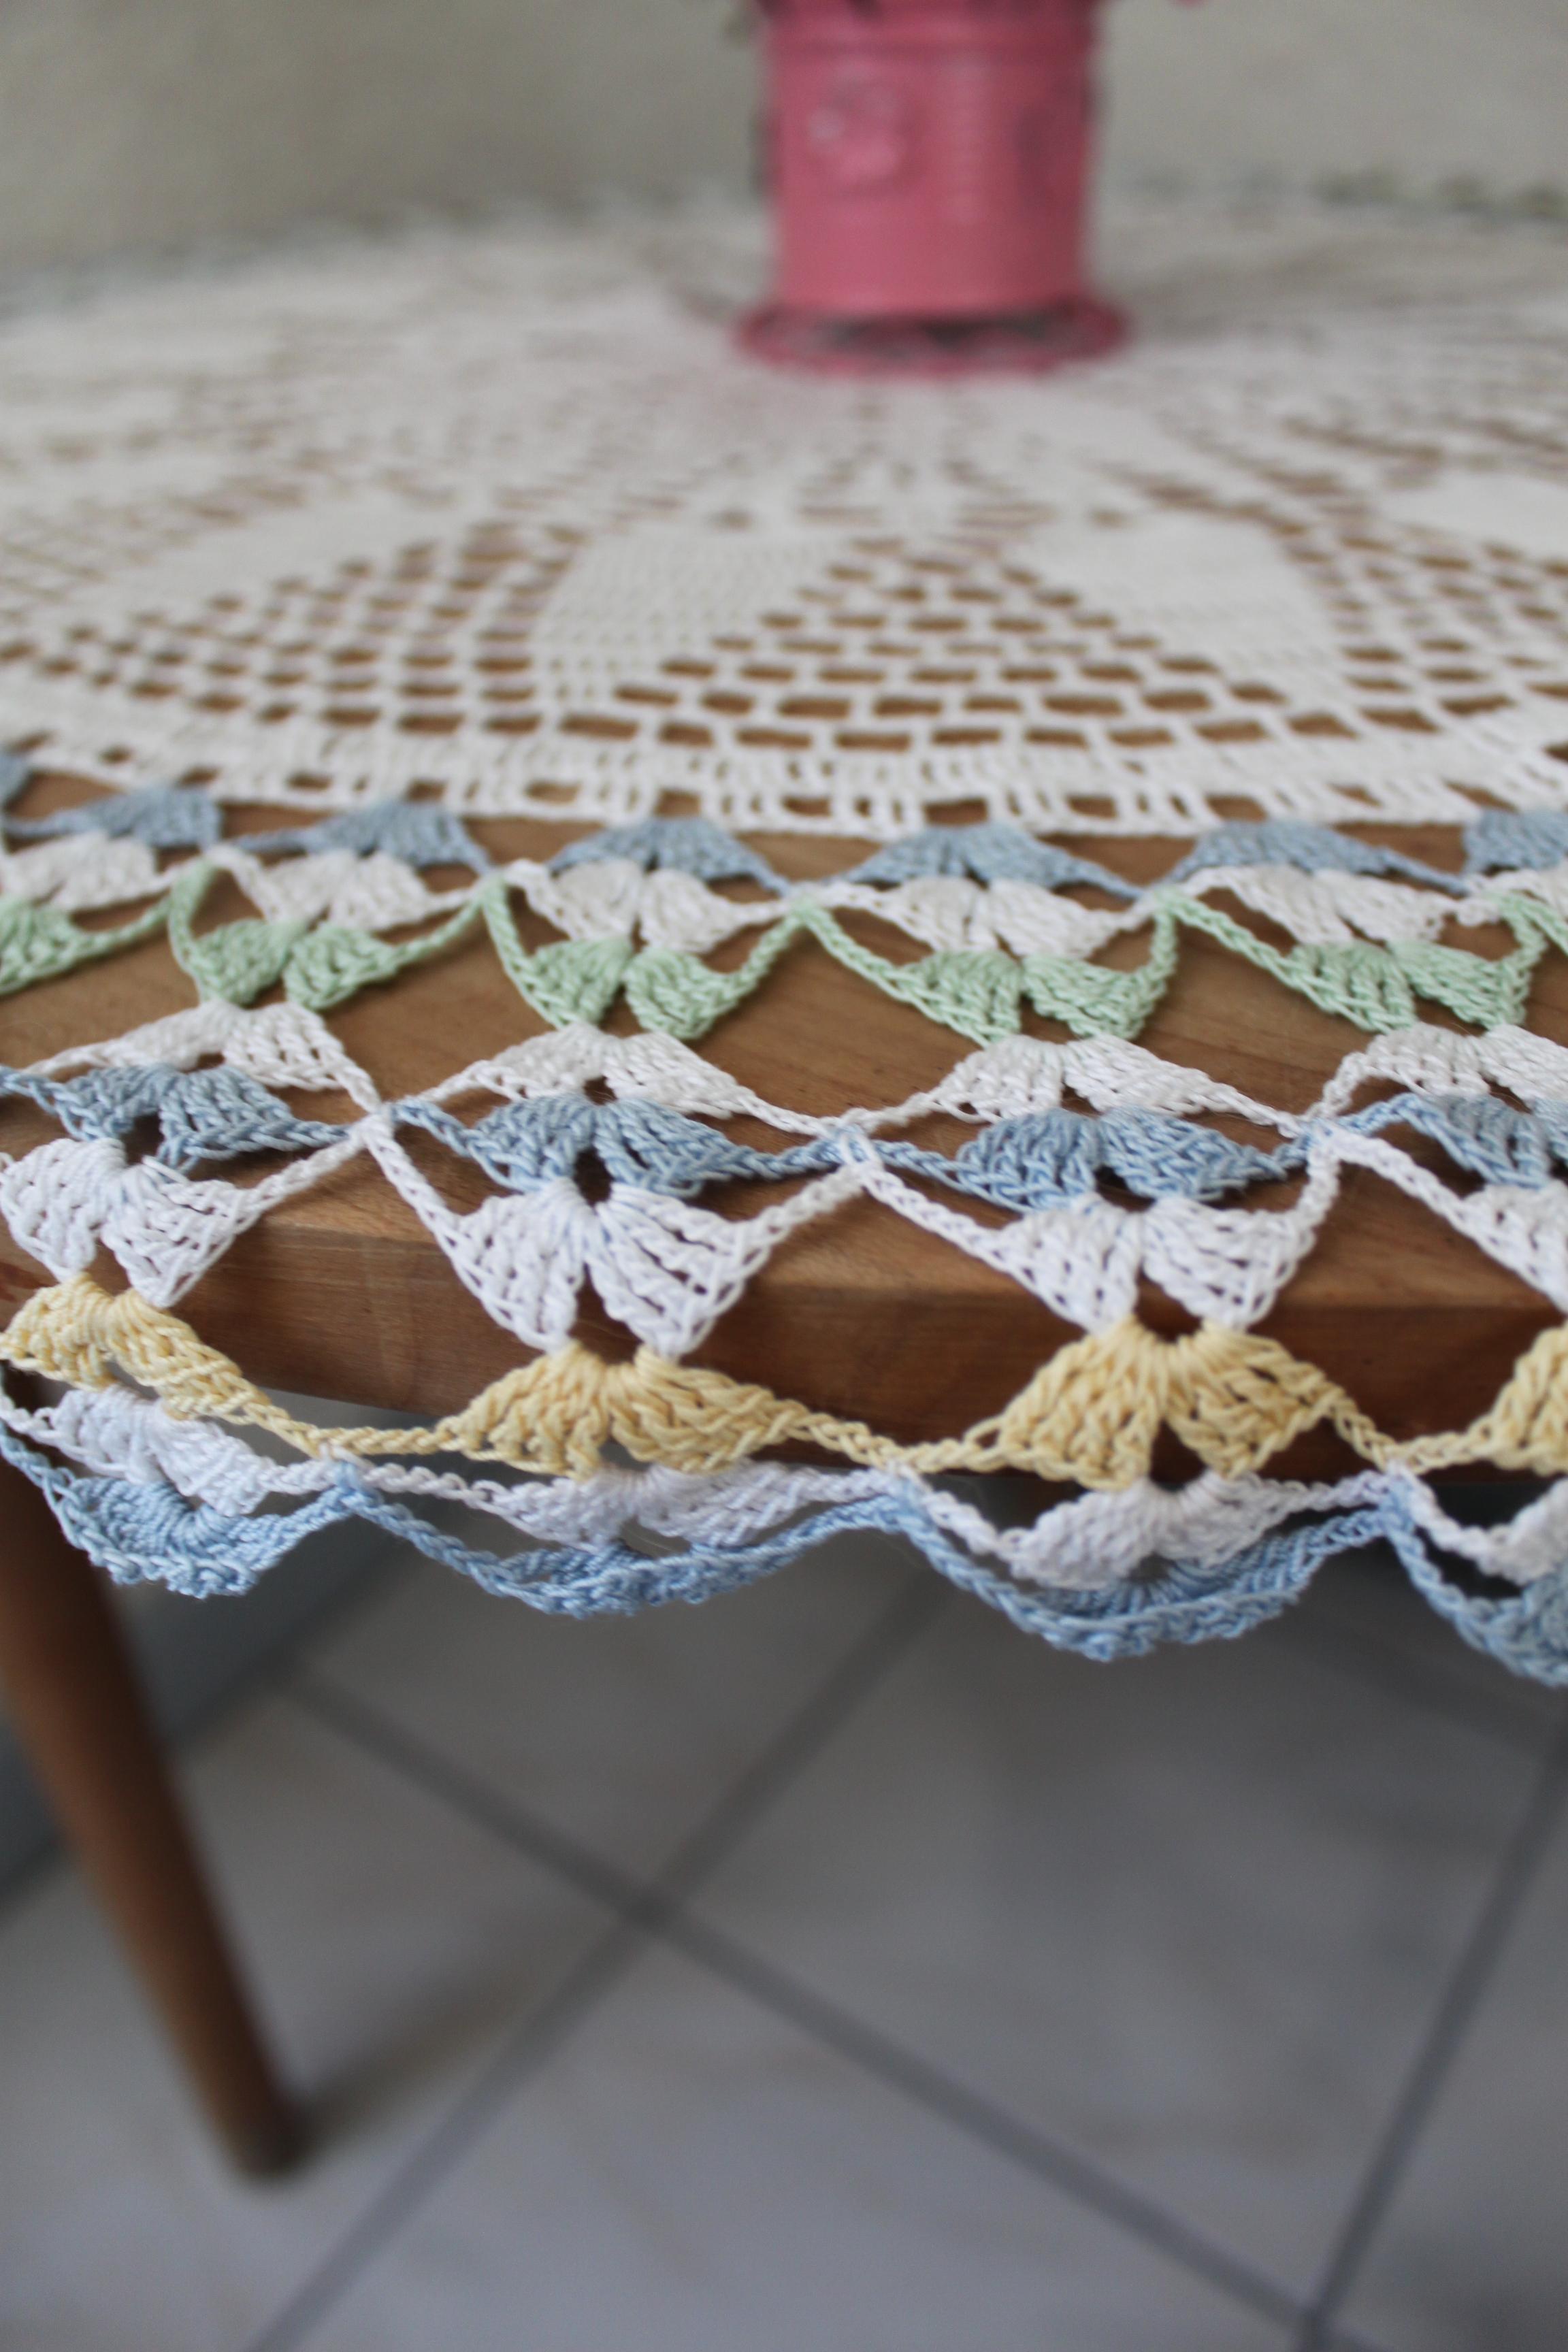 Grand Napperon Au Crochet concernant grand napperon de guéridon, centre de table ronde au crochet ou